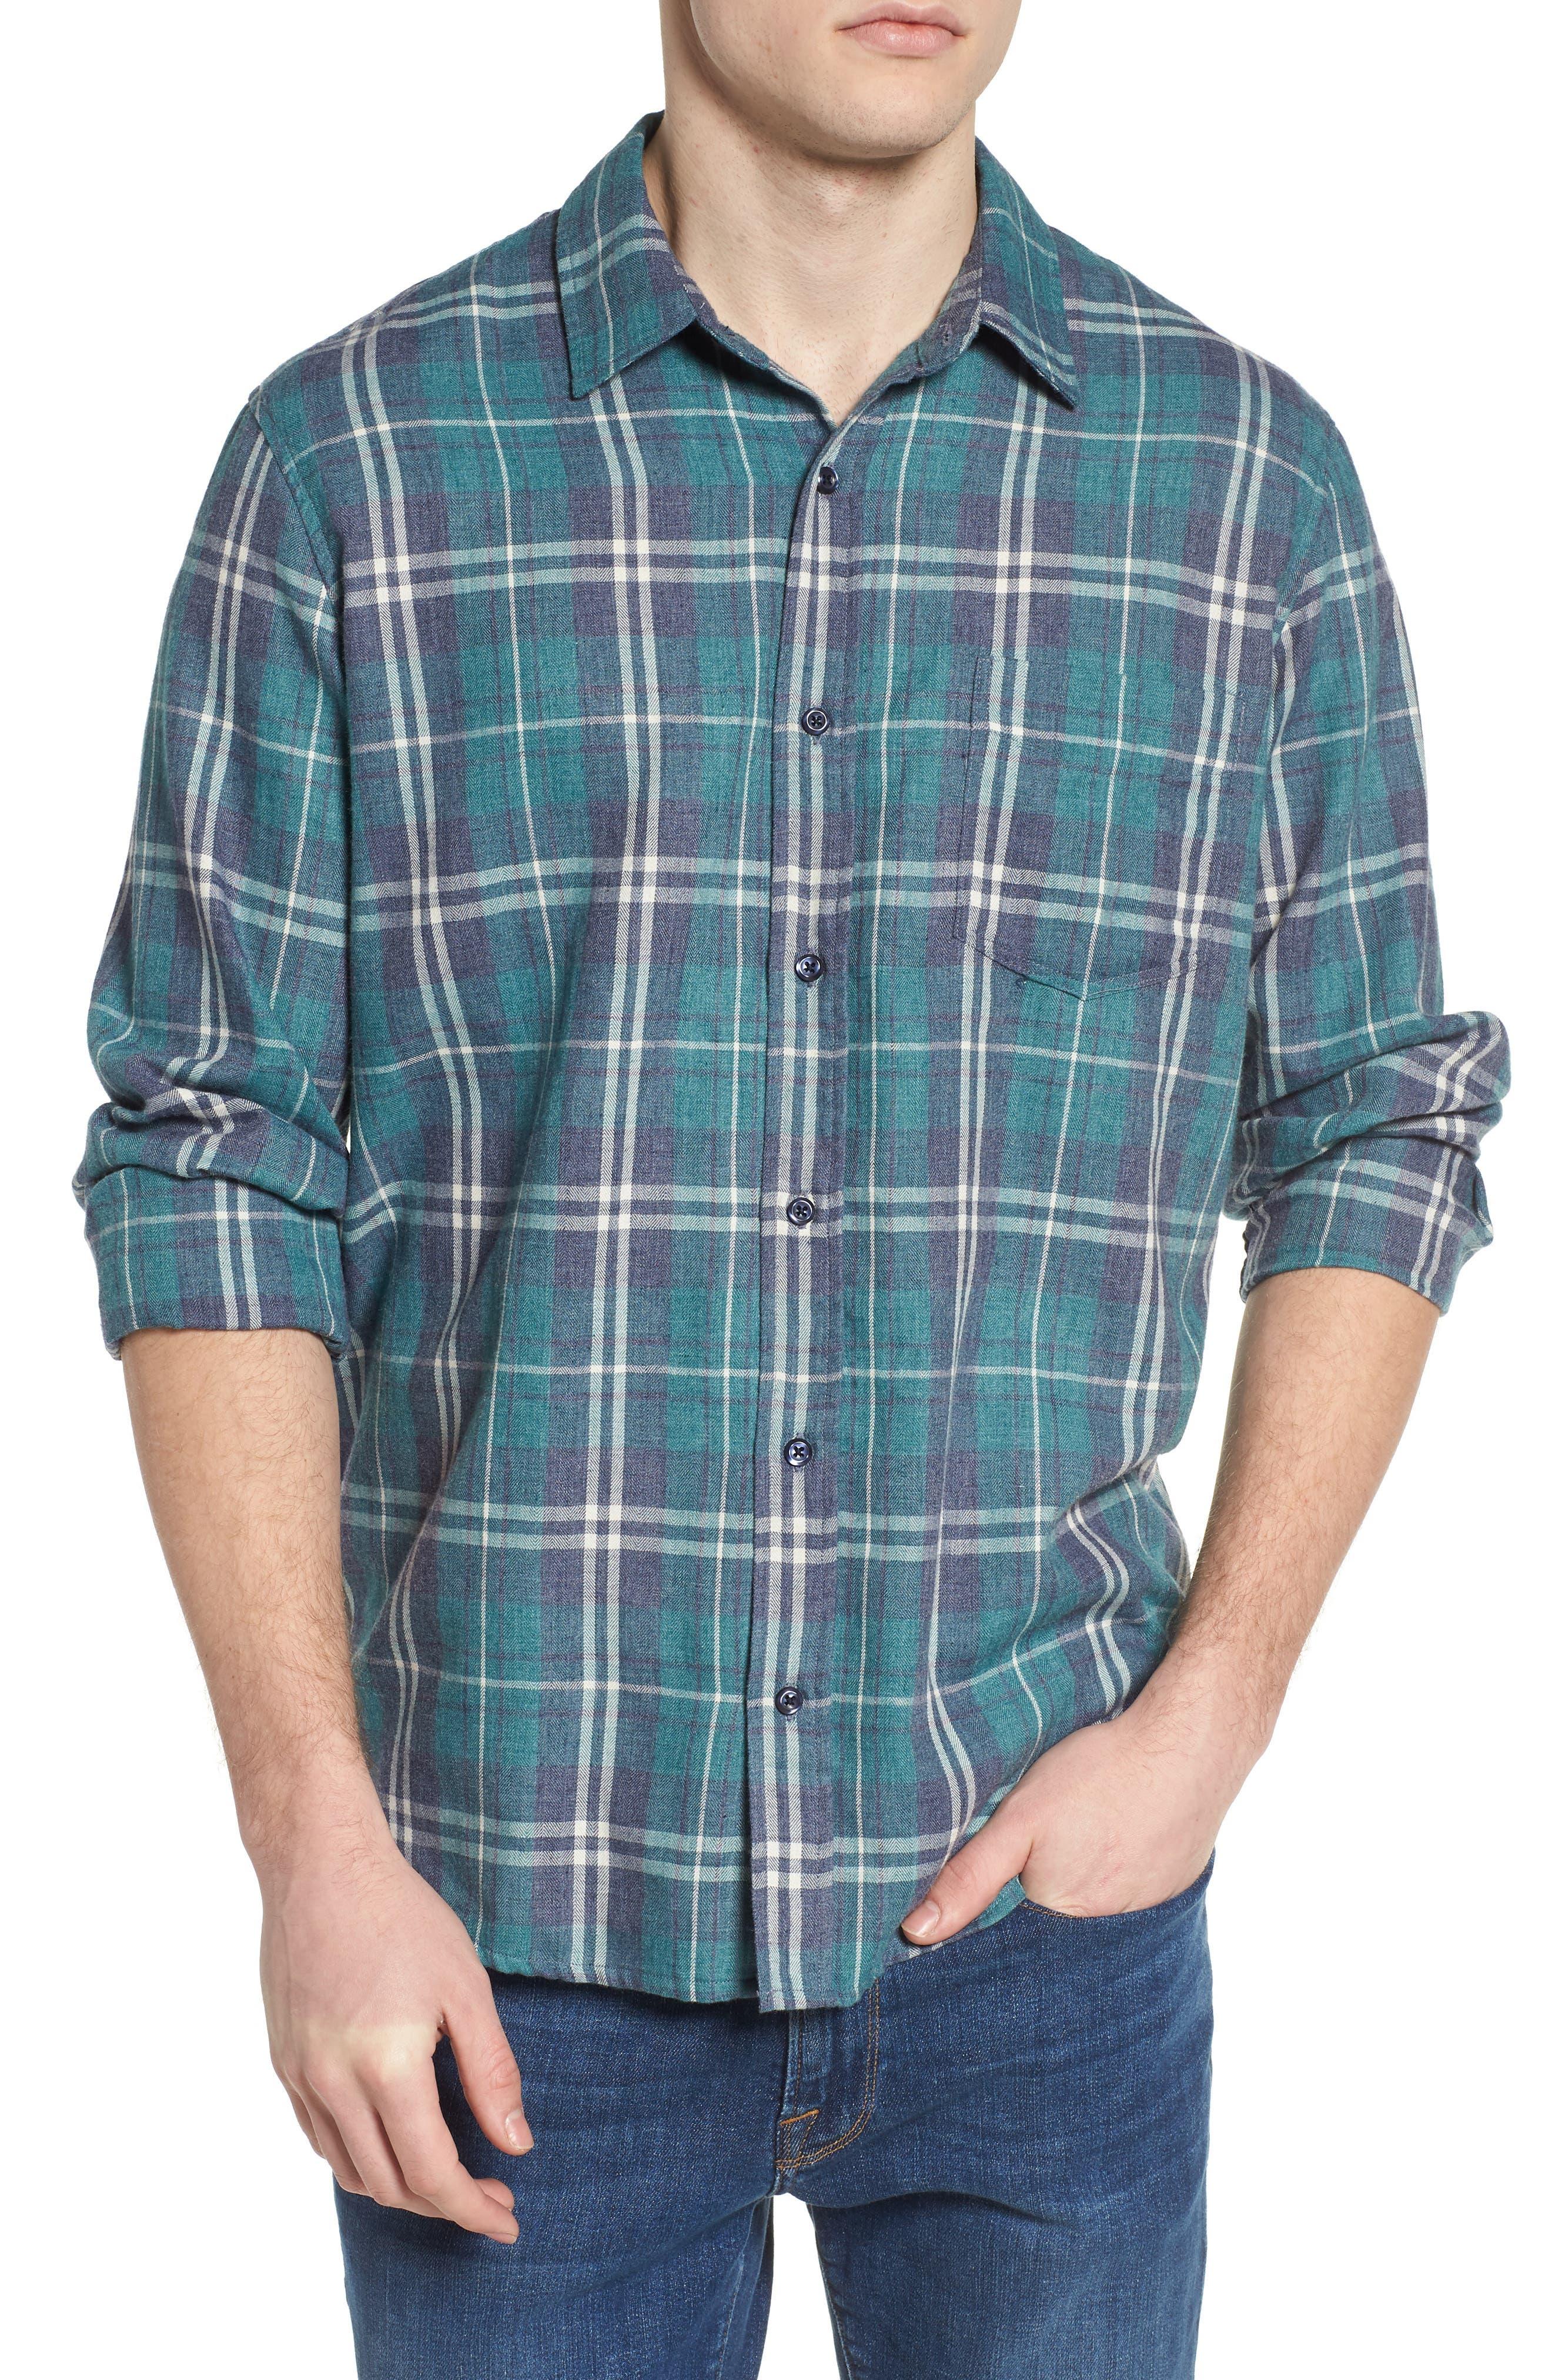 Lennox Slim Fit Plaid Woven Shirt,                             Main thumbnail 1, color,                             Veridian Navy White